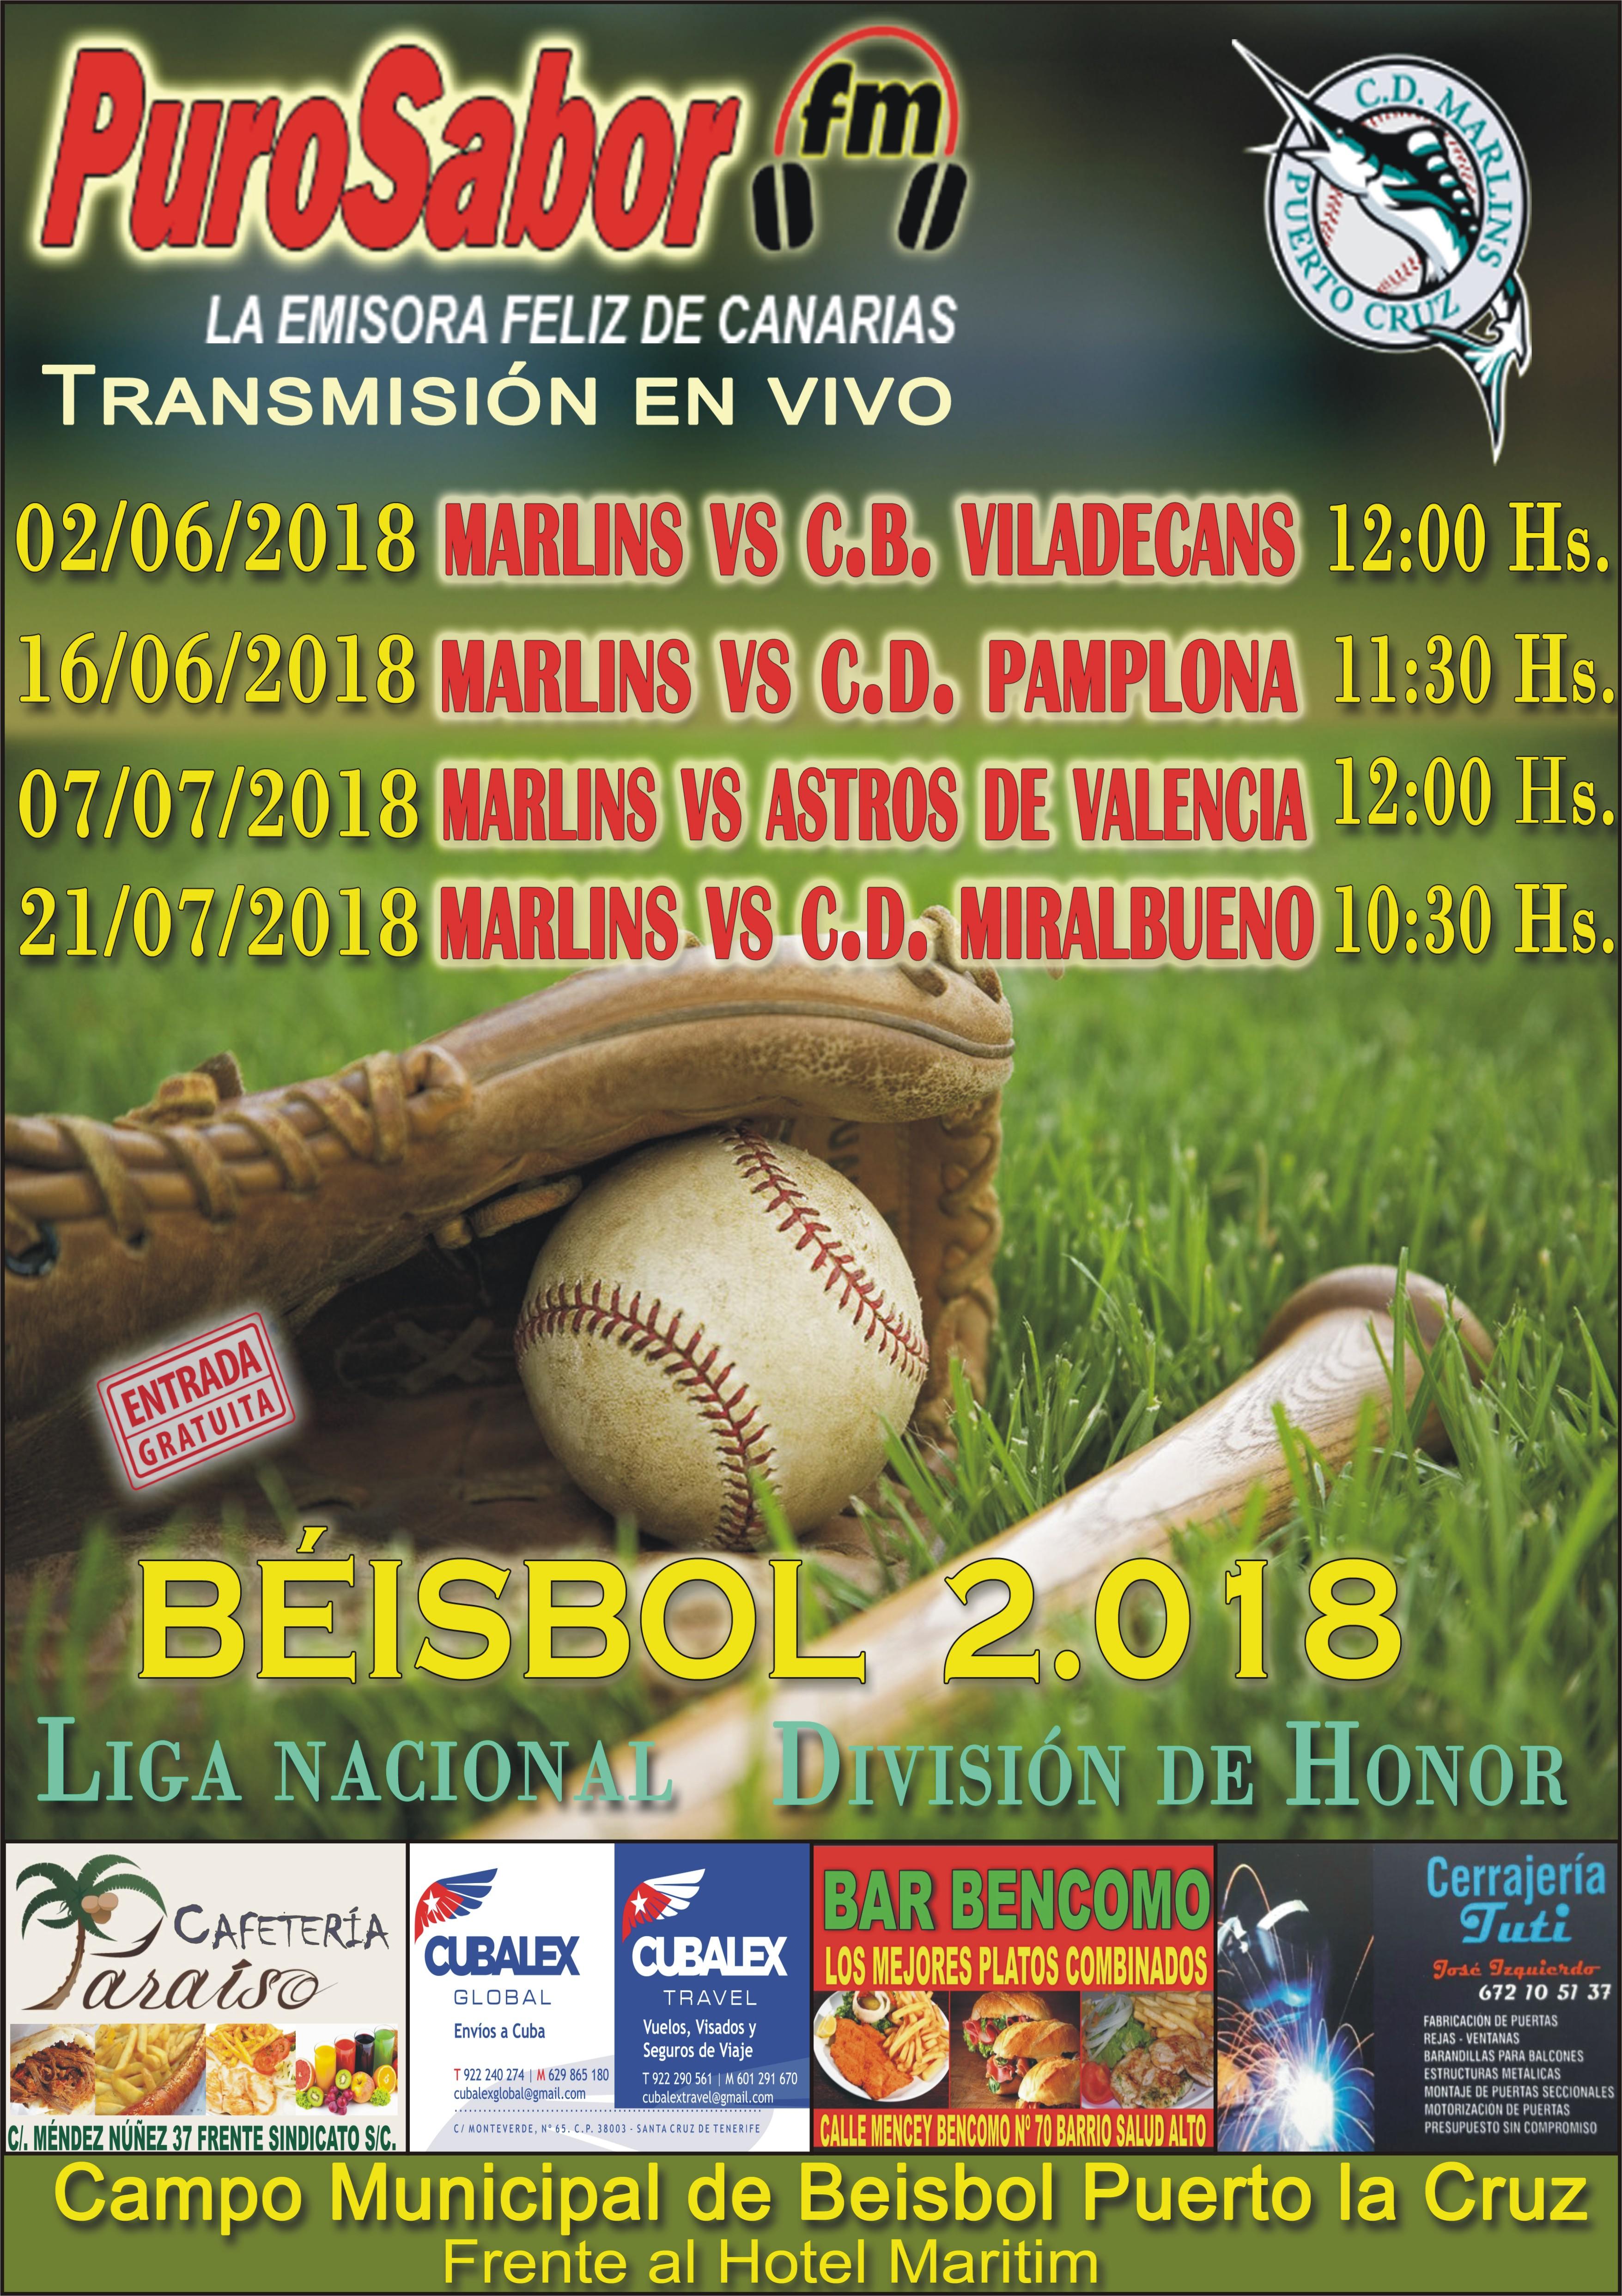 CARTEL BEISBOL MAYO 2018 CUATRO